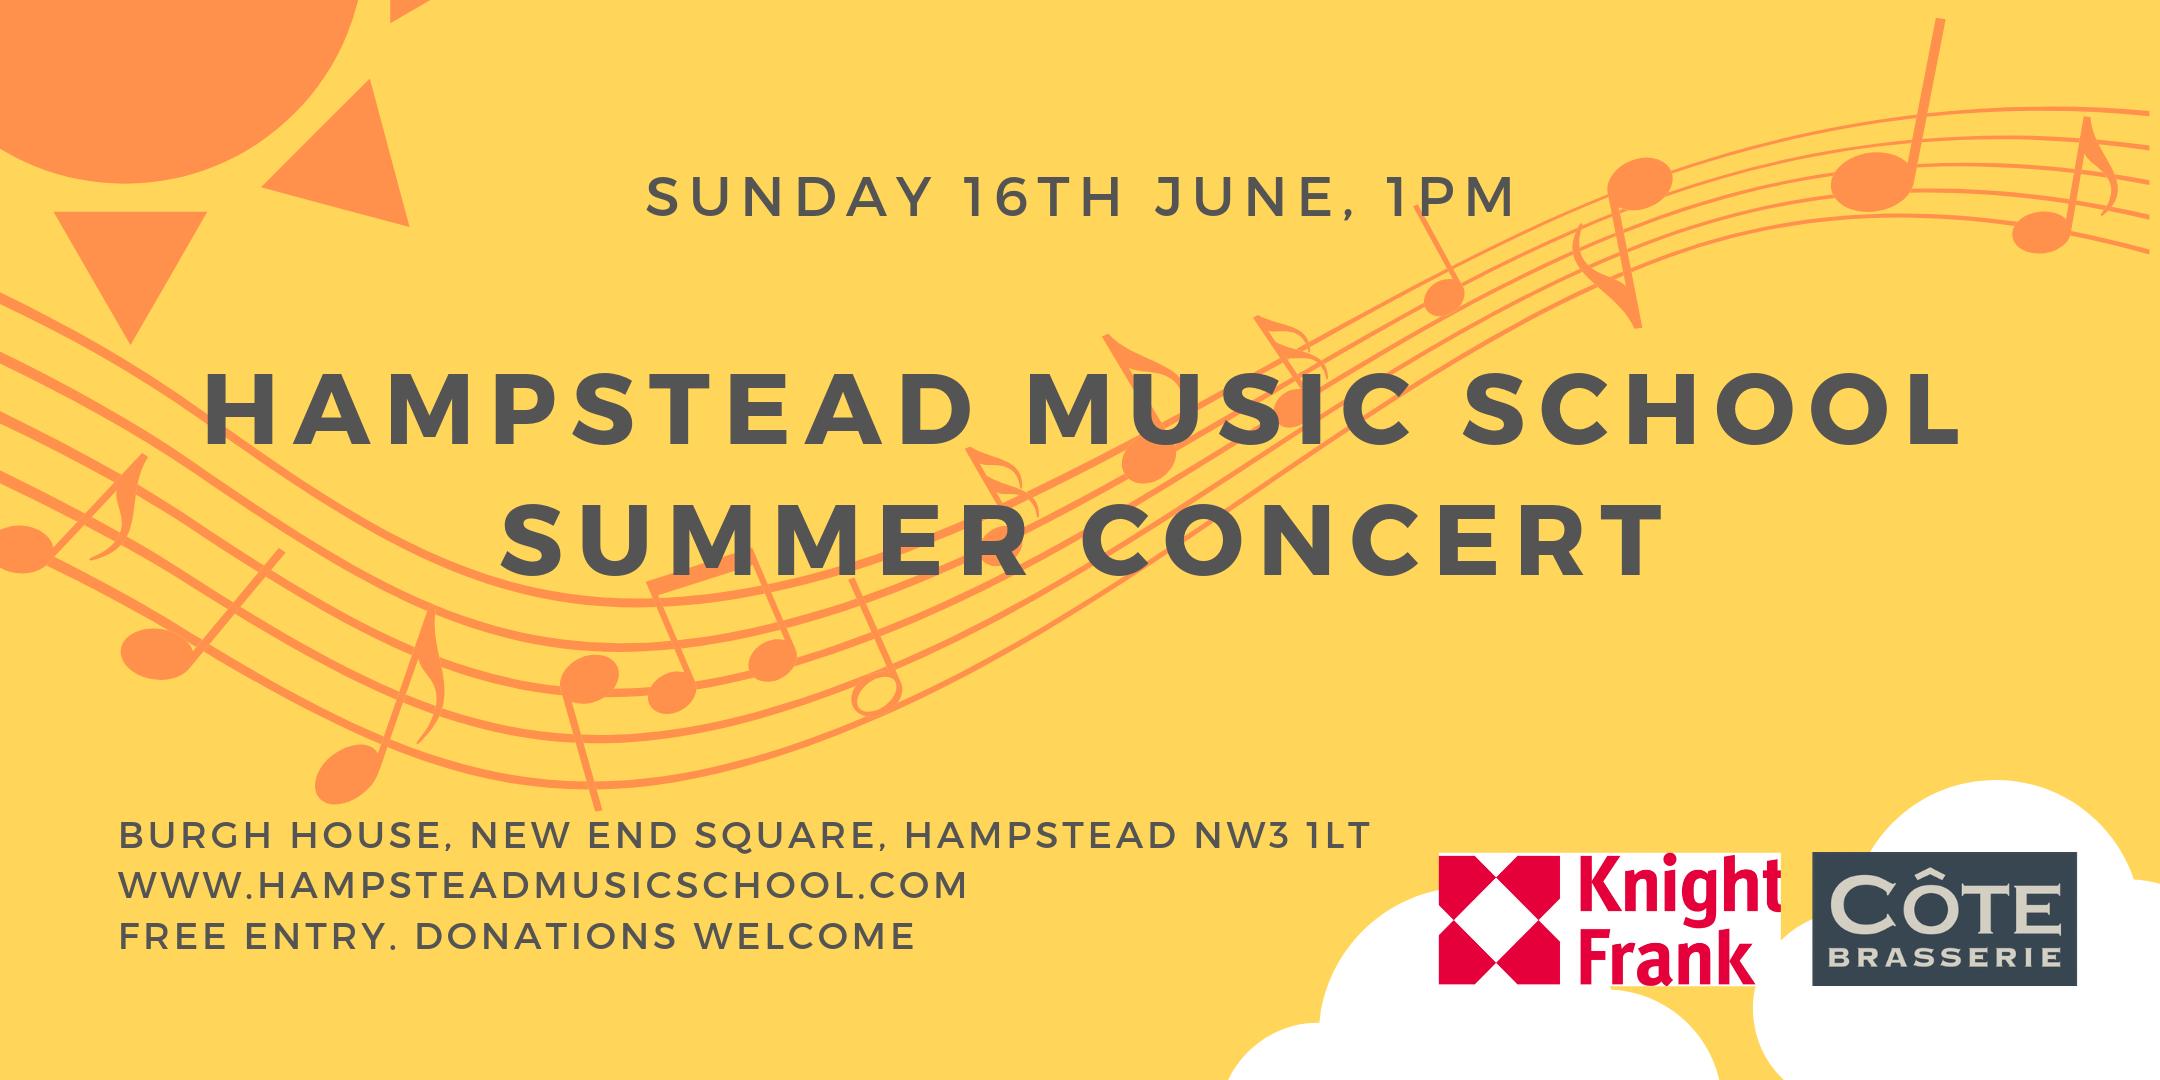 hampstead music school-5.png